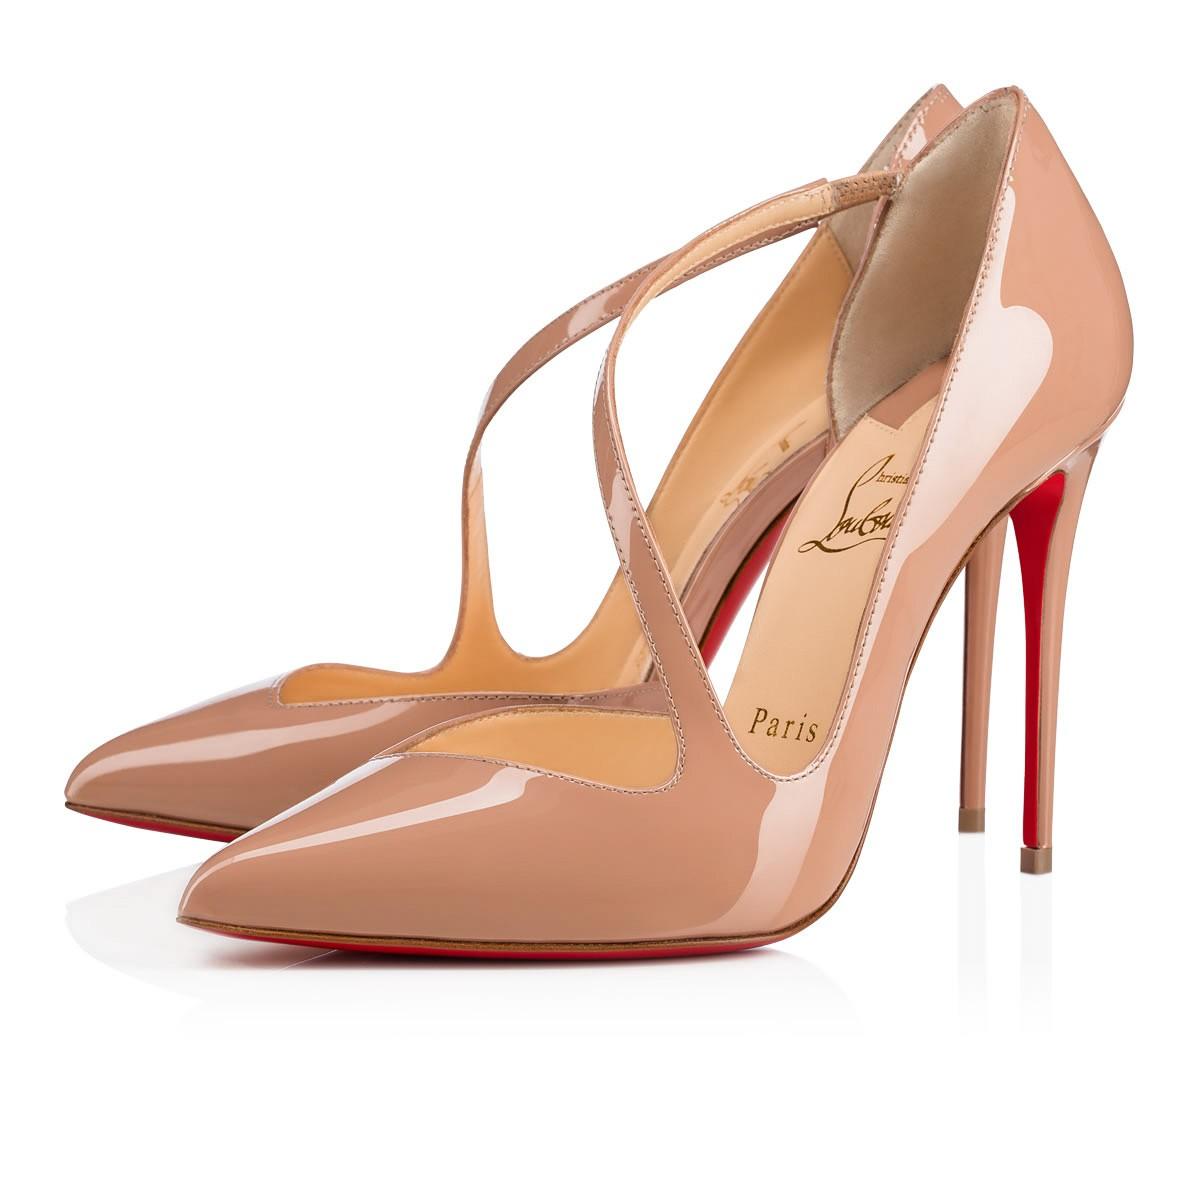 8e7d417fa9b2 ... coupon for jumping 100 nude patent leather women shoes christian  louboutin ea5e1 a4fd4